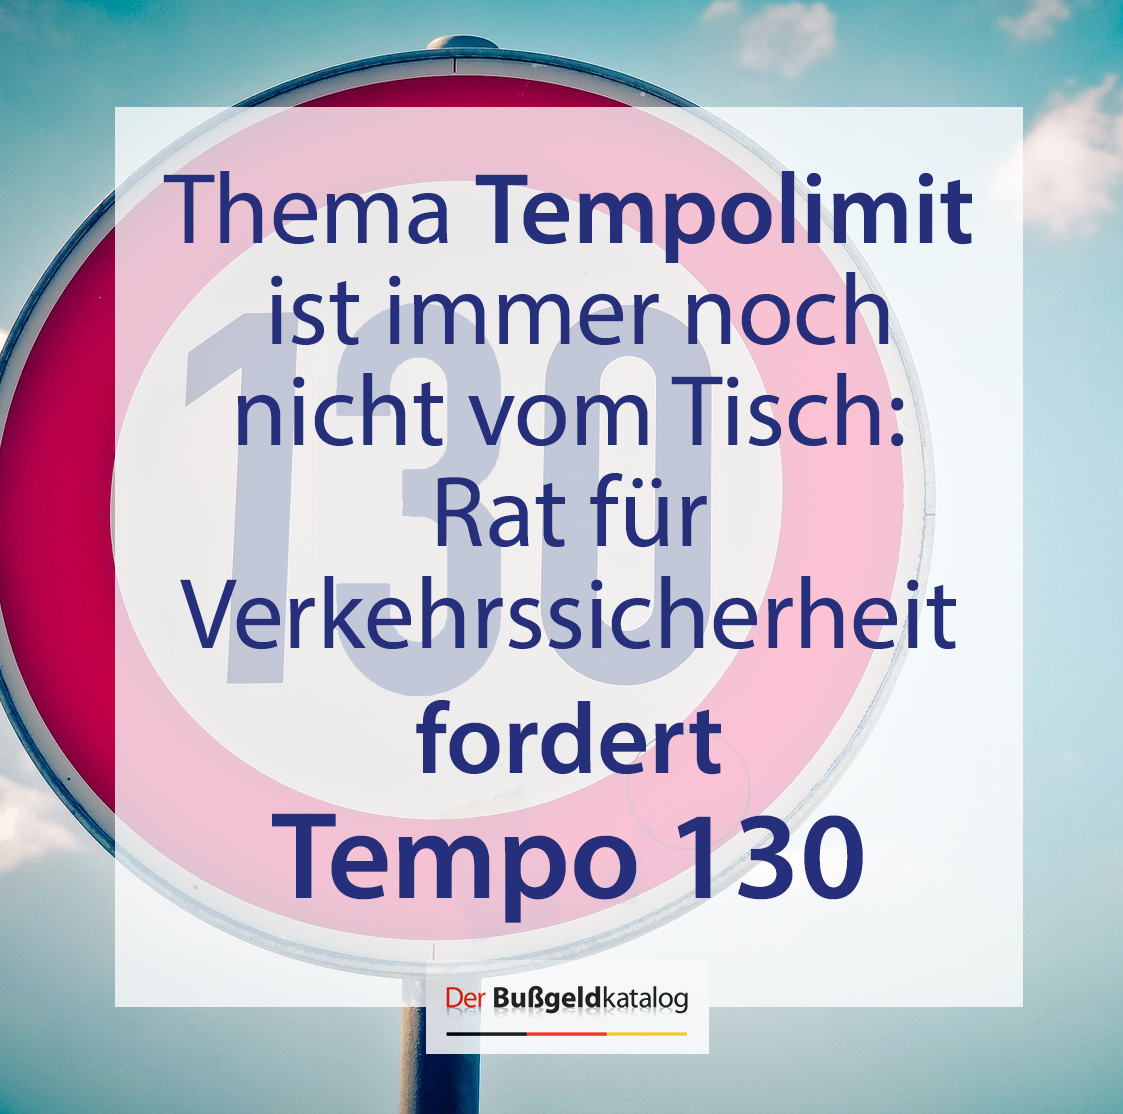 #Tempolimit